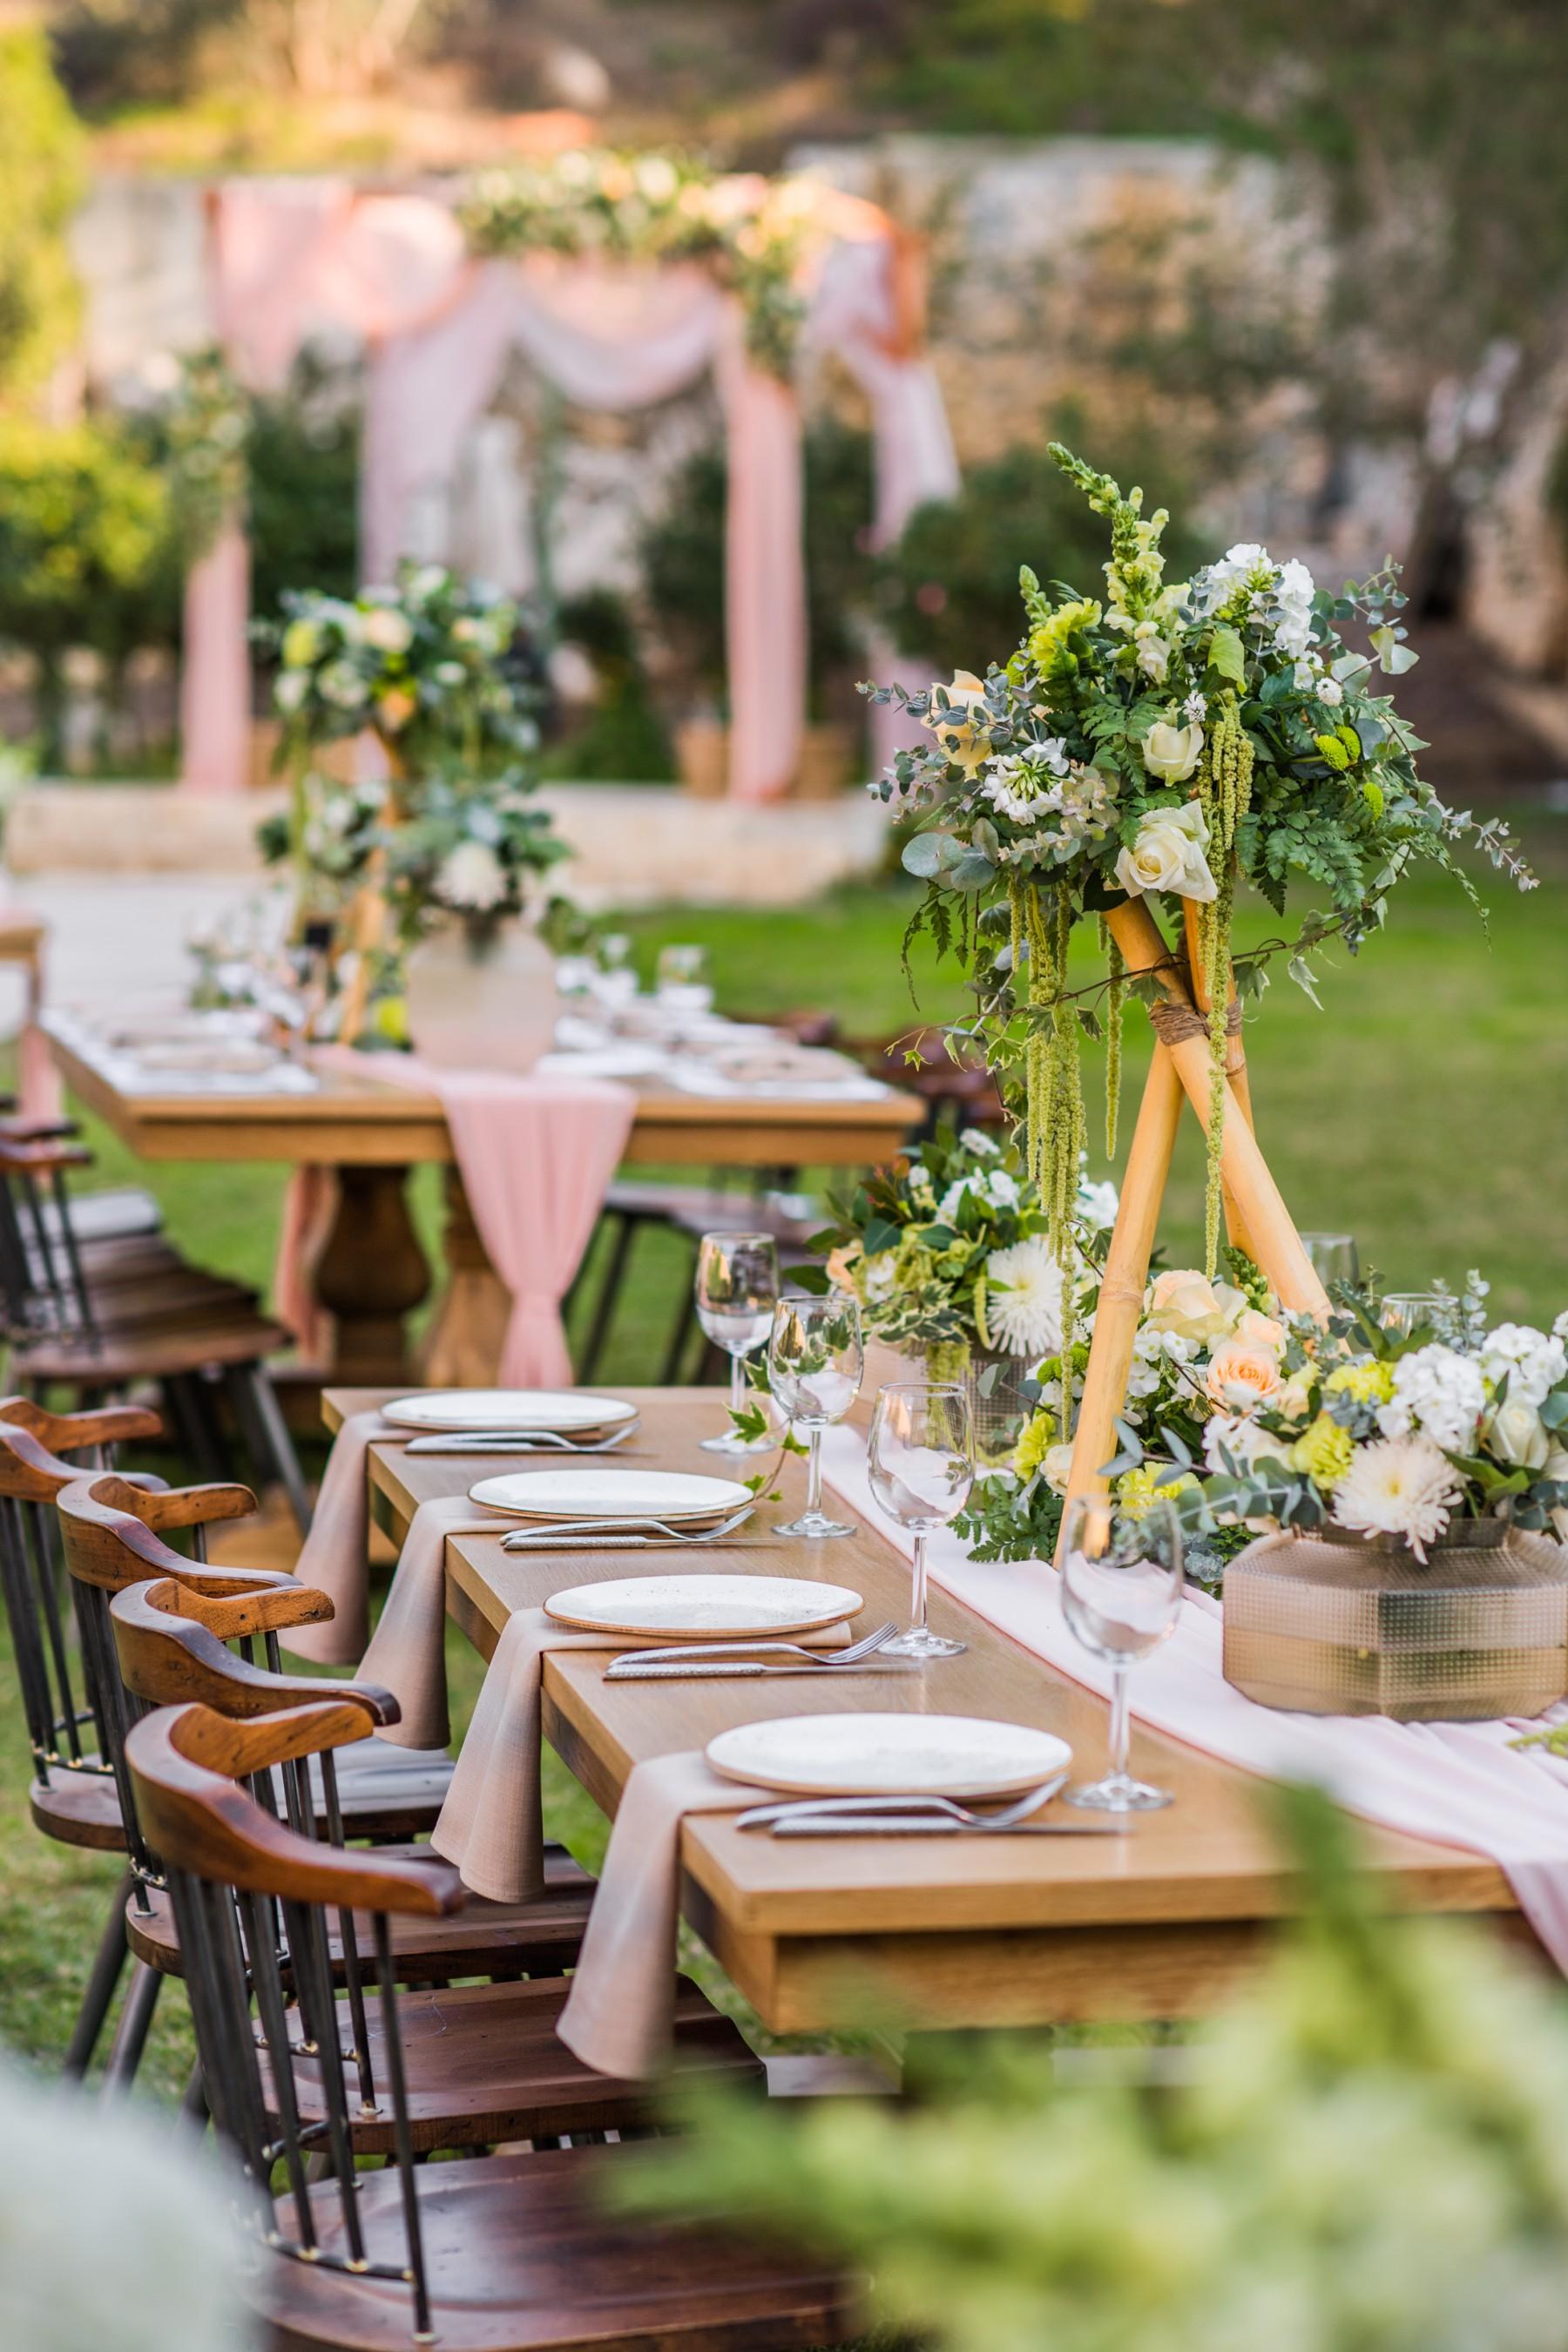 100% Vegan: המדריך המלא לחתונה טבעונית